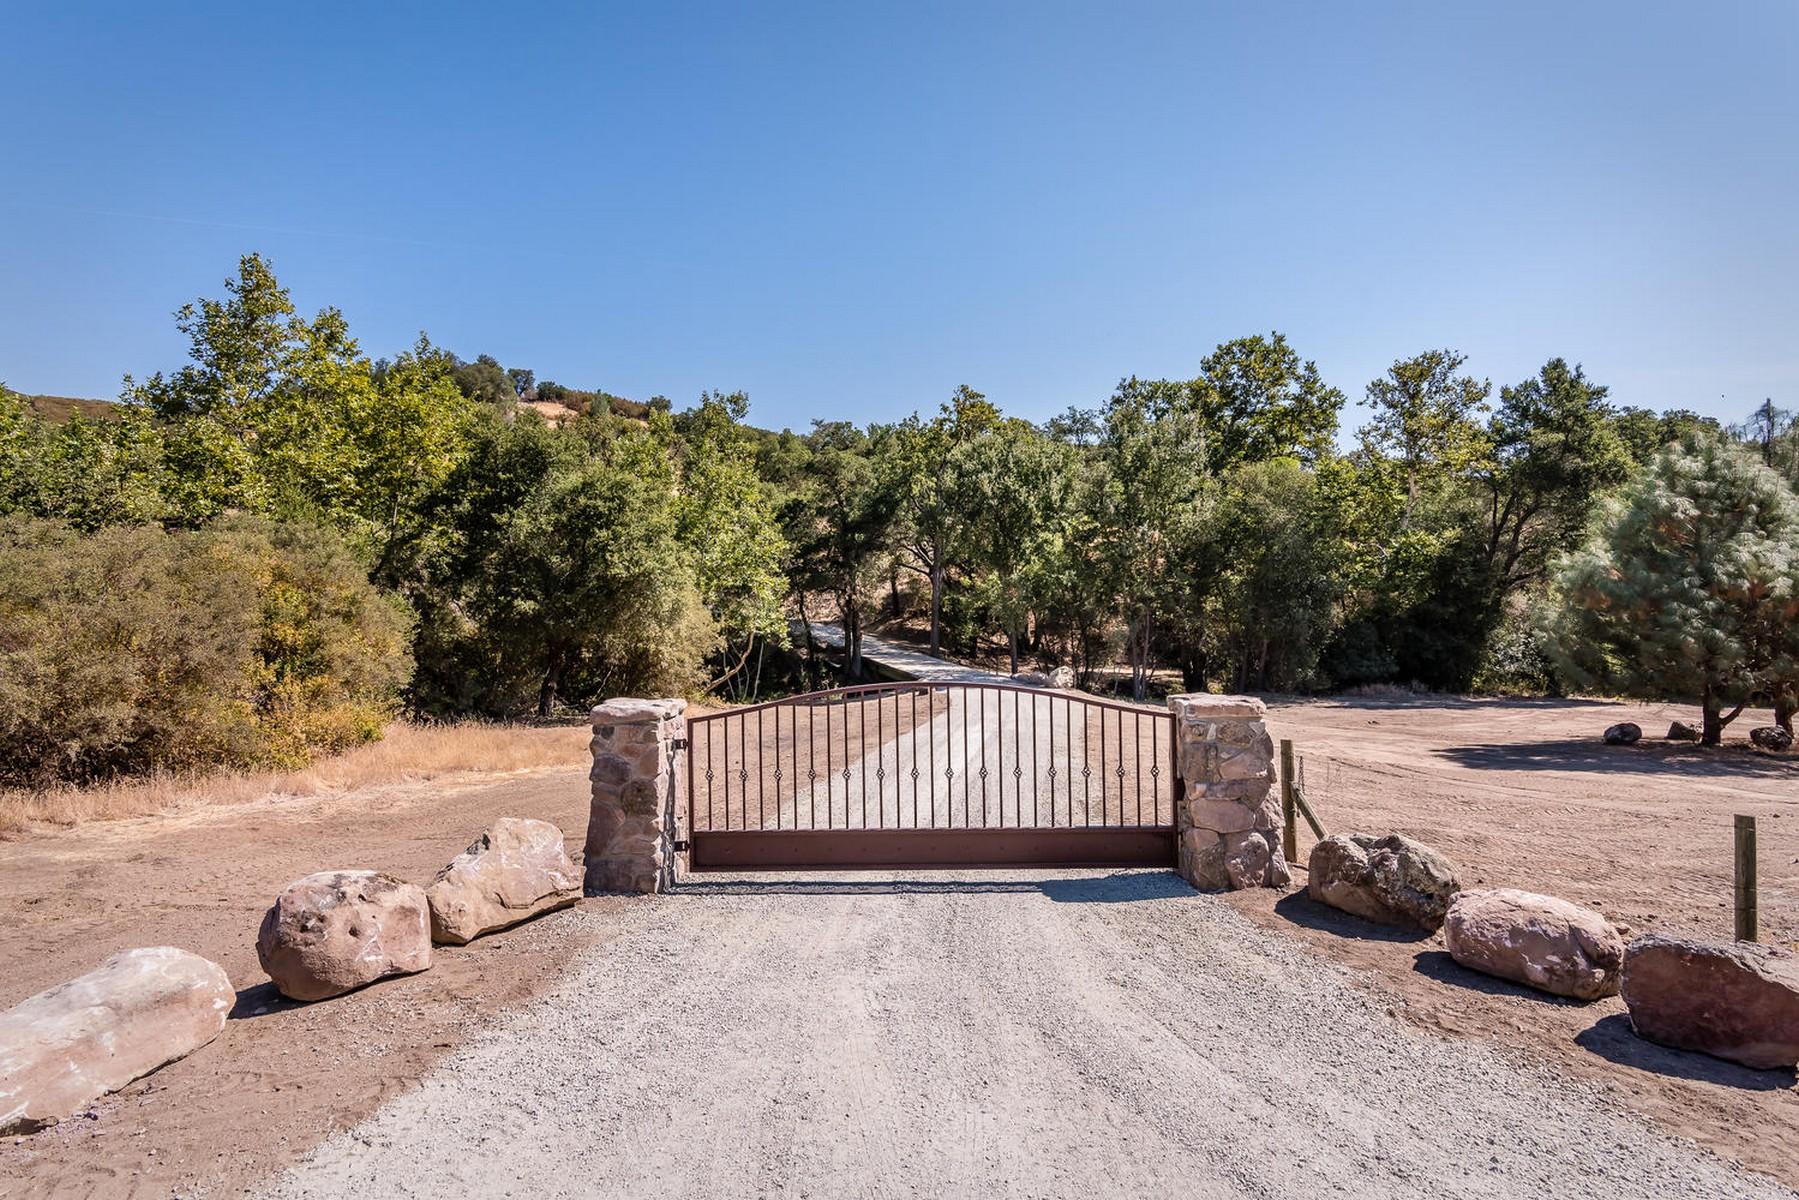 Land for Sale at Majestic Hill & Valley Views 8781 Tassajara Creek Road Santa Margarita, California, 93453 United States